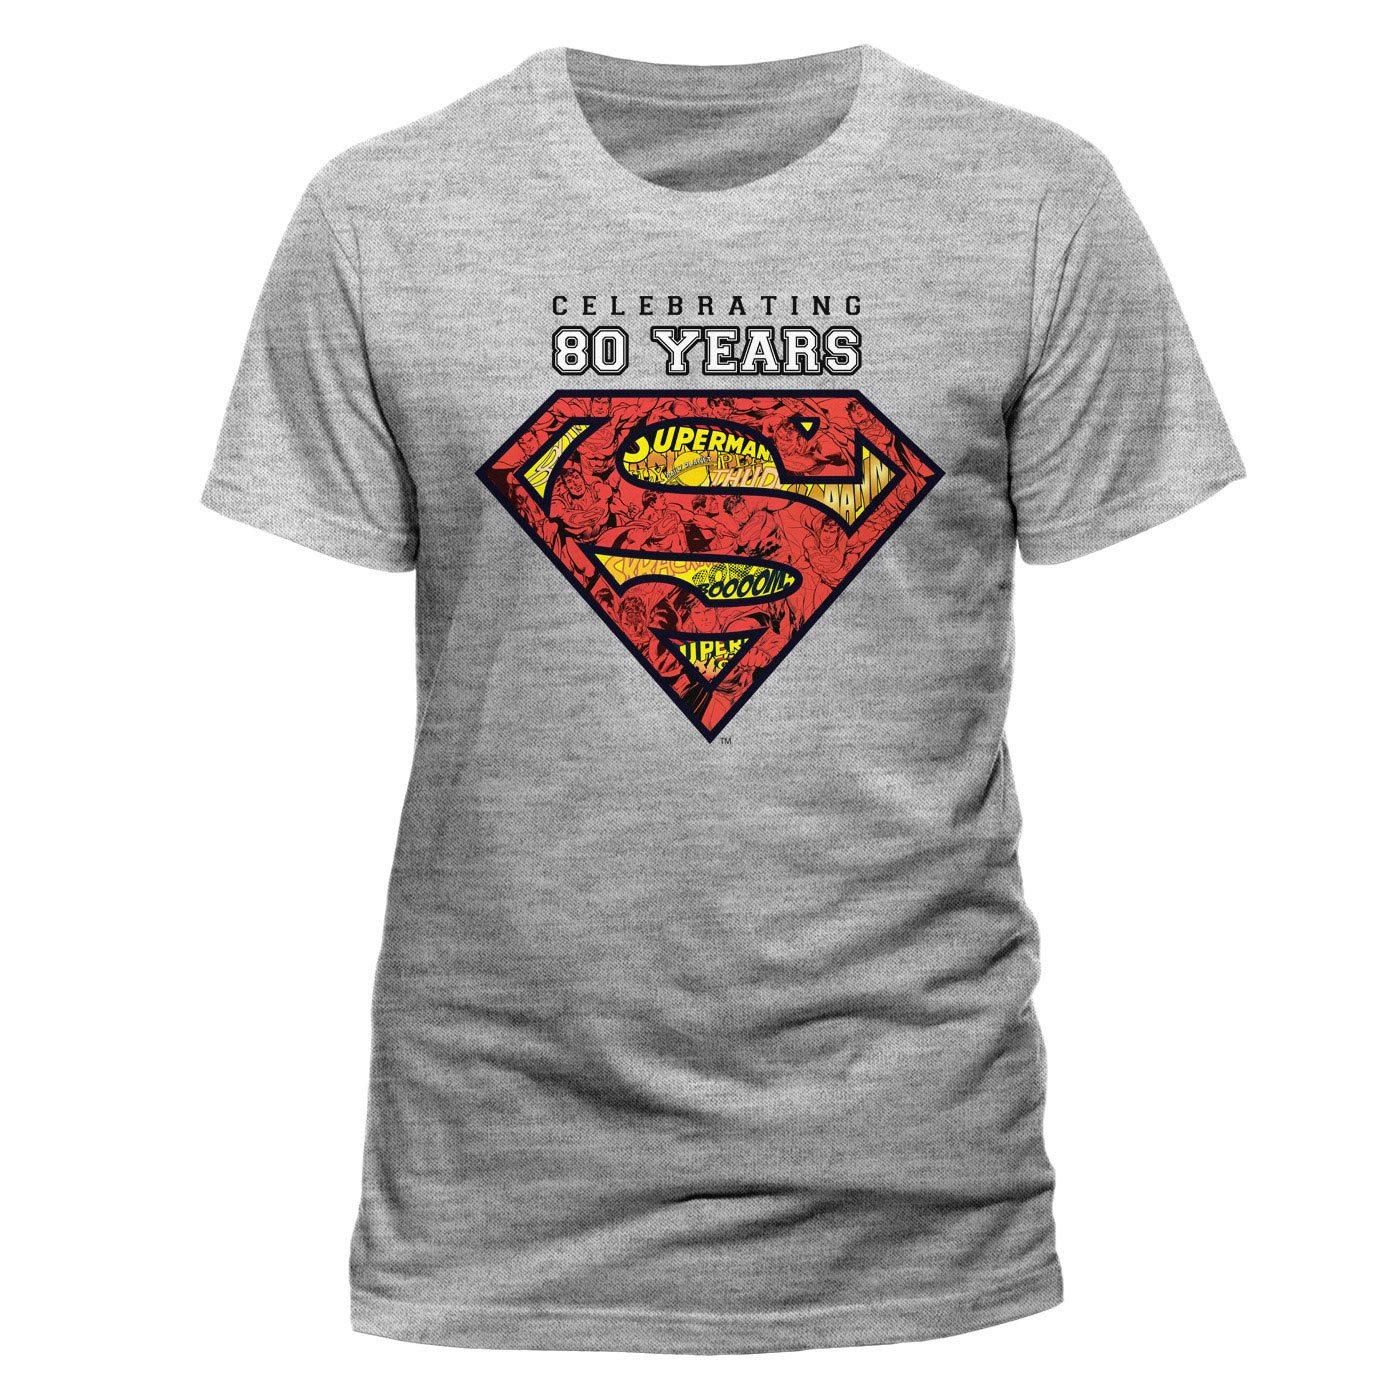 Superman T-Shirt Celebrating 80 Years Size S